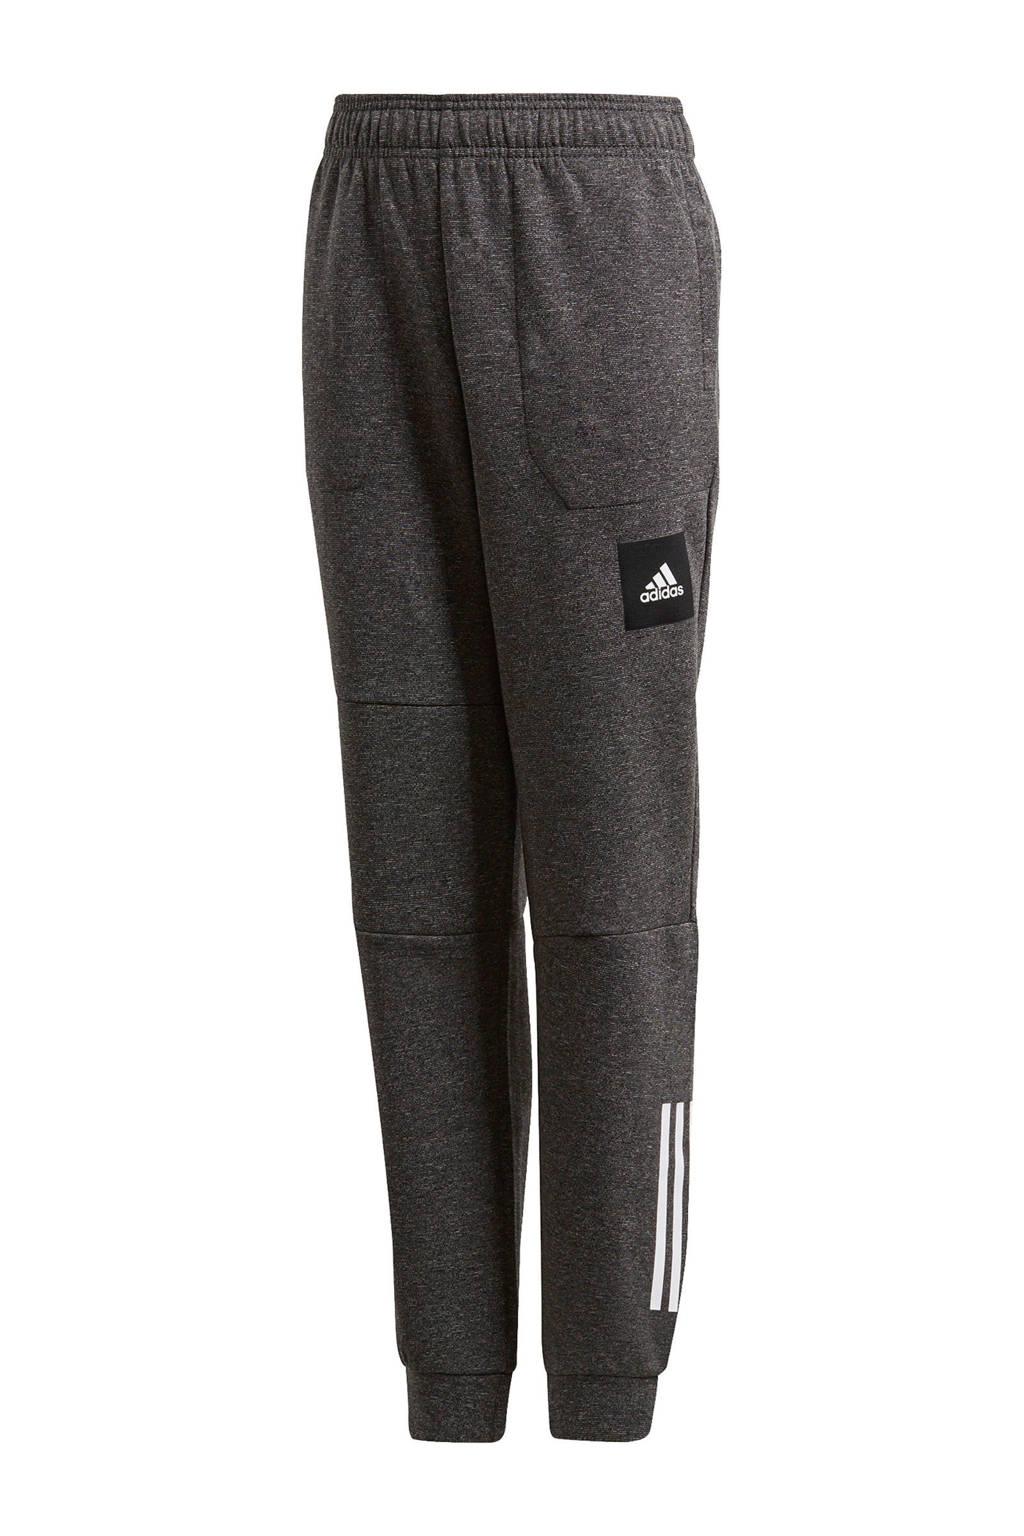 adidas Performance   joggingbroek antraciet, Antraciet